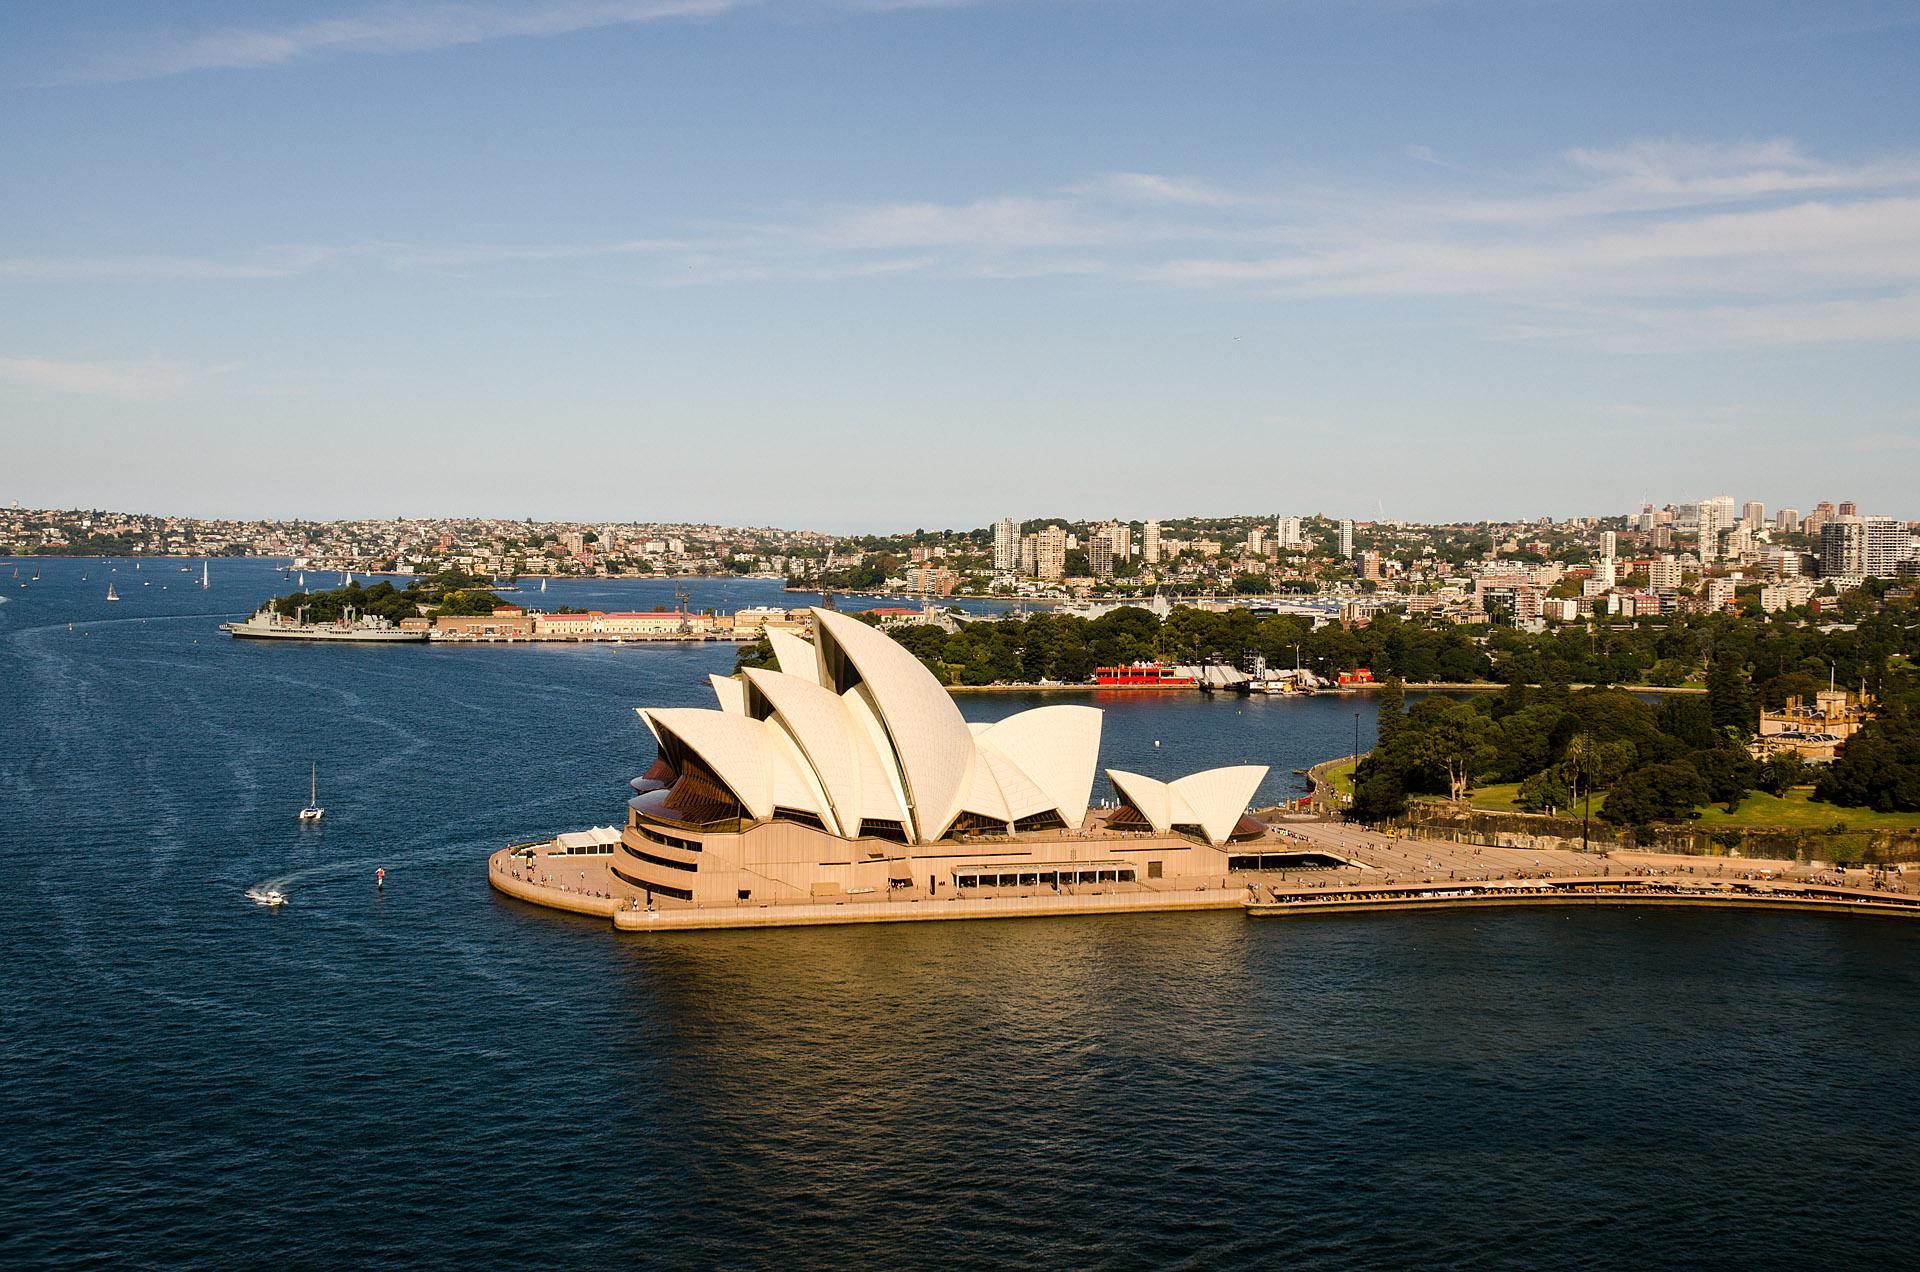 Sydney Harbour, Royal Botanic Gardens & Government House